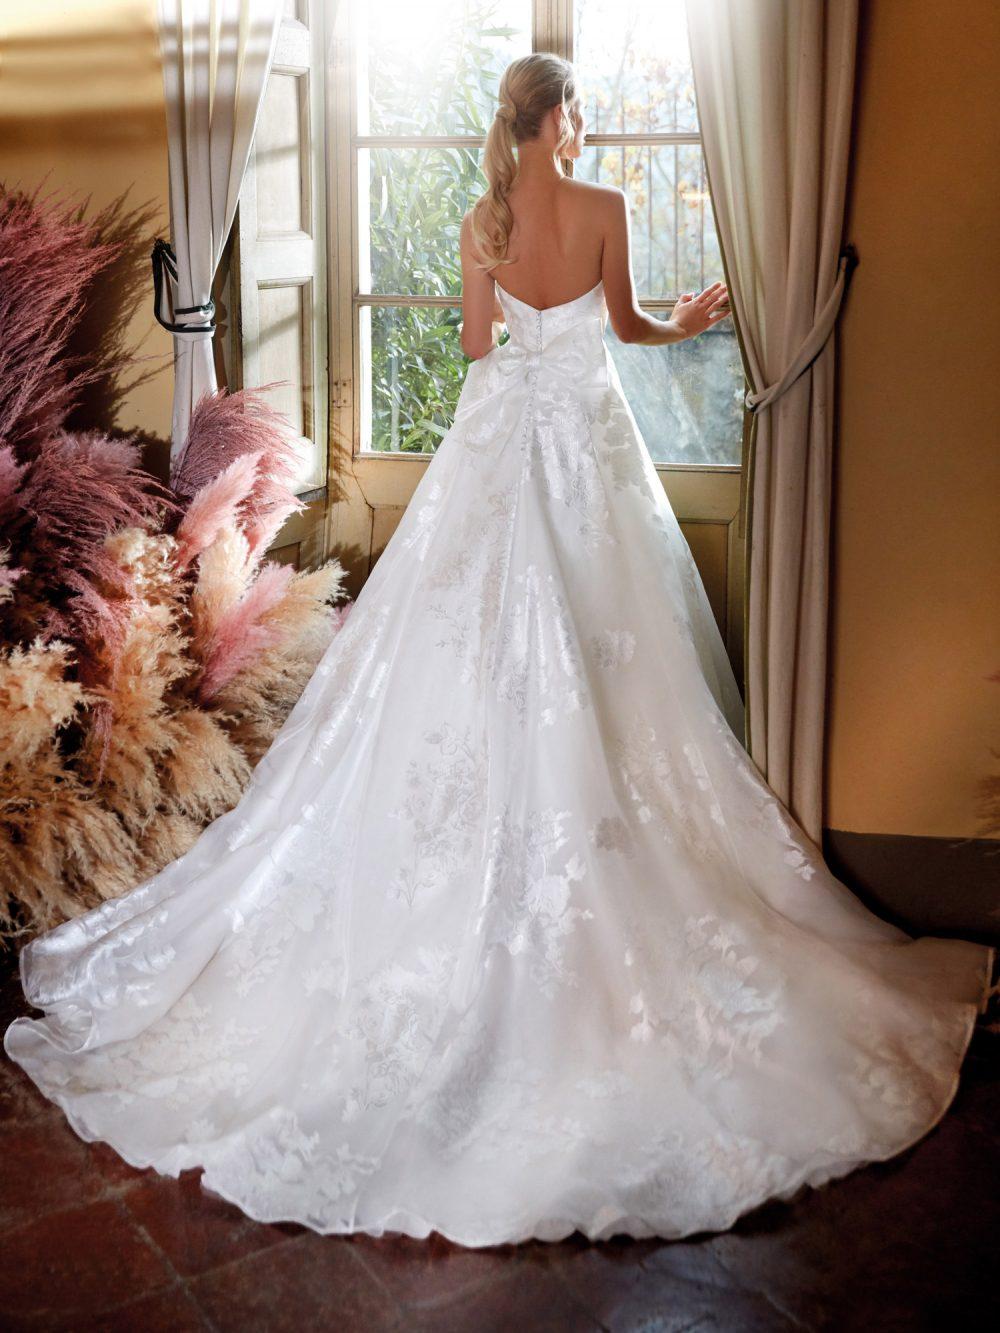 Mariages: abito da sposa Colet 2021 a Vicenza, Verona, Padova, Veneto CO12105